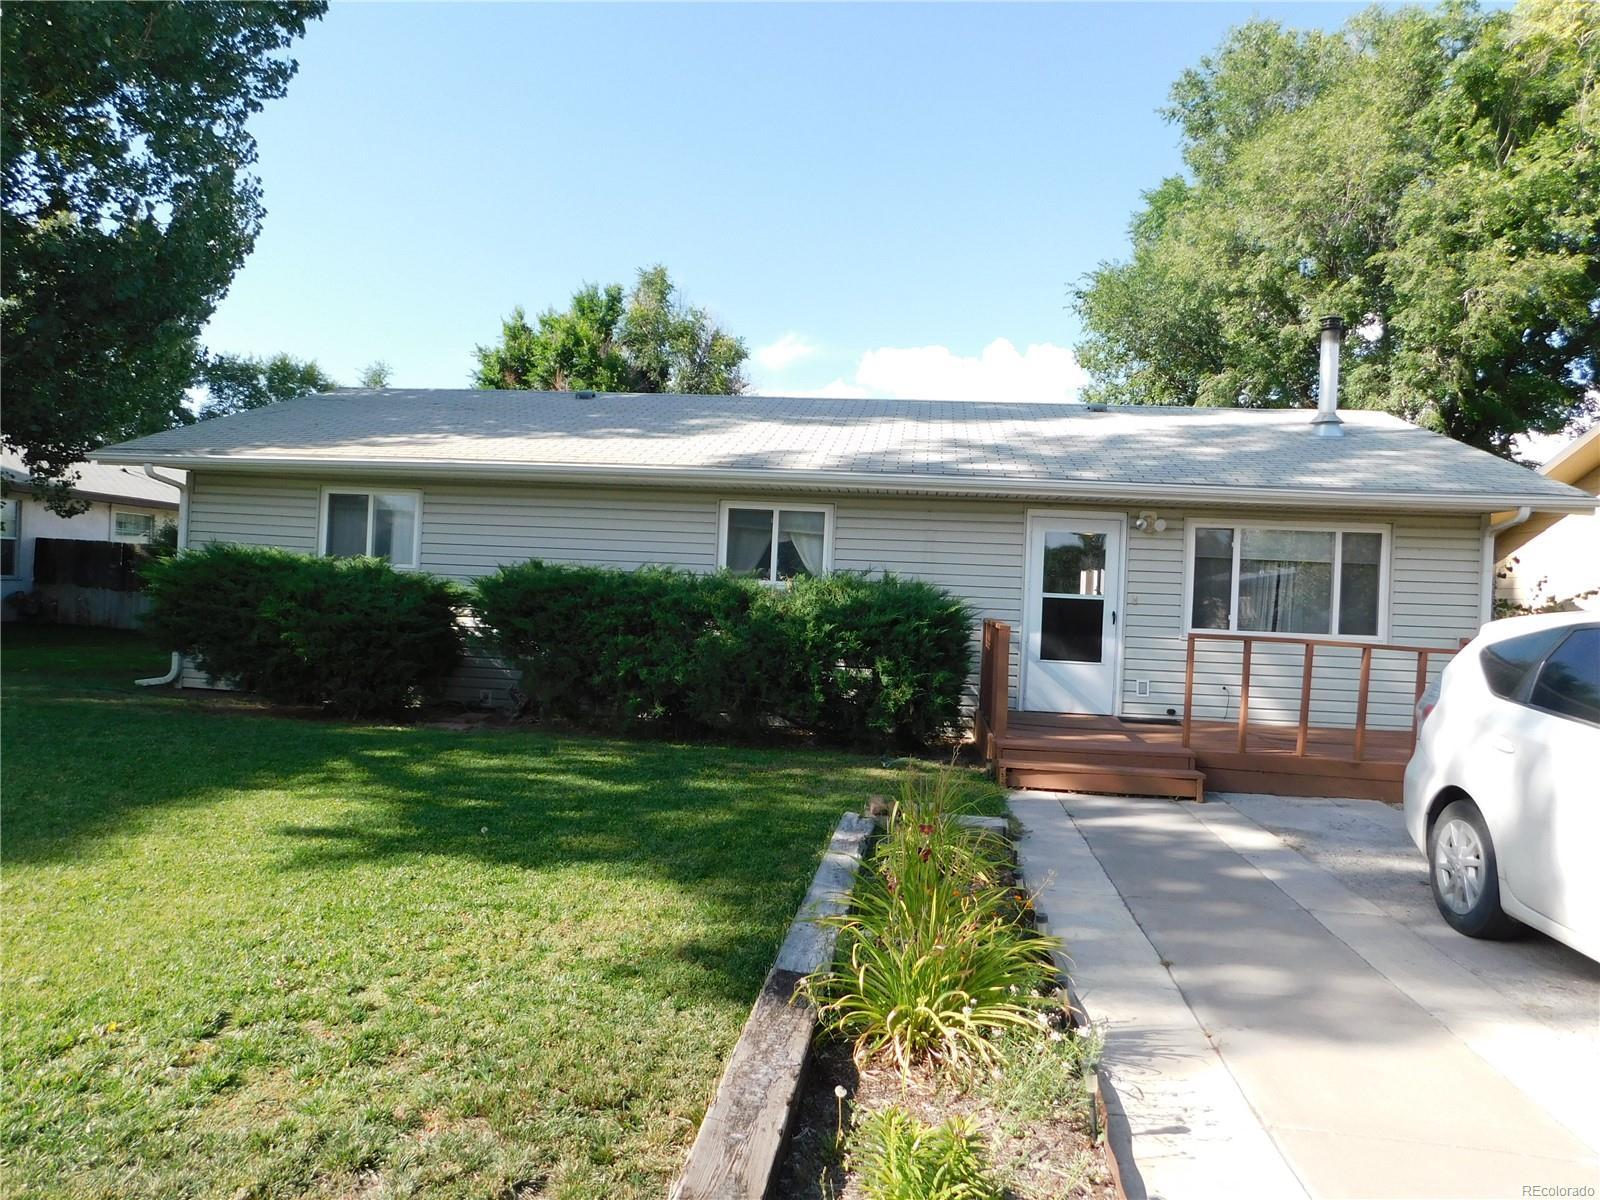 230 Bonney Drive, Alamosa, CO 81101 - Alamosa, CO real estate listing